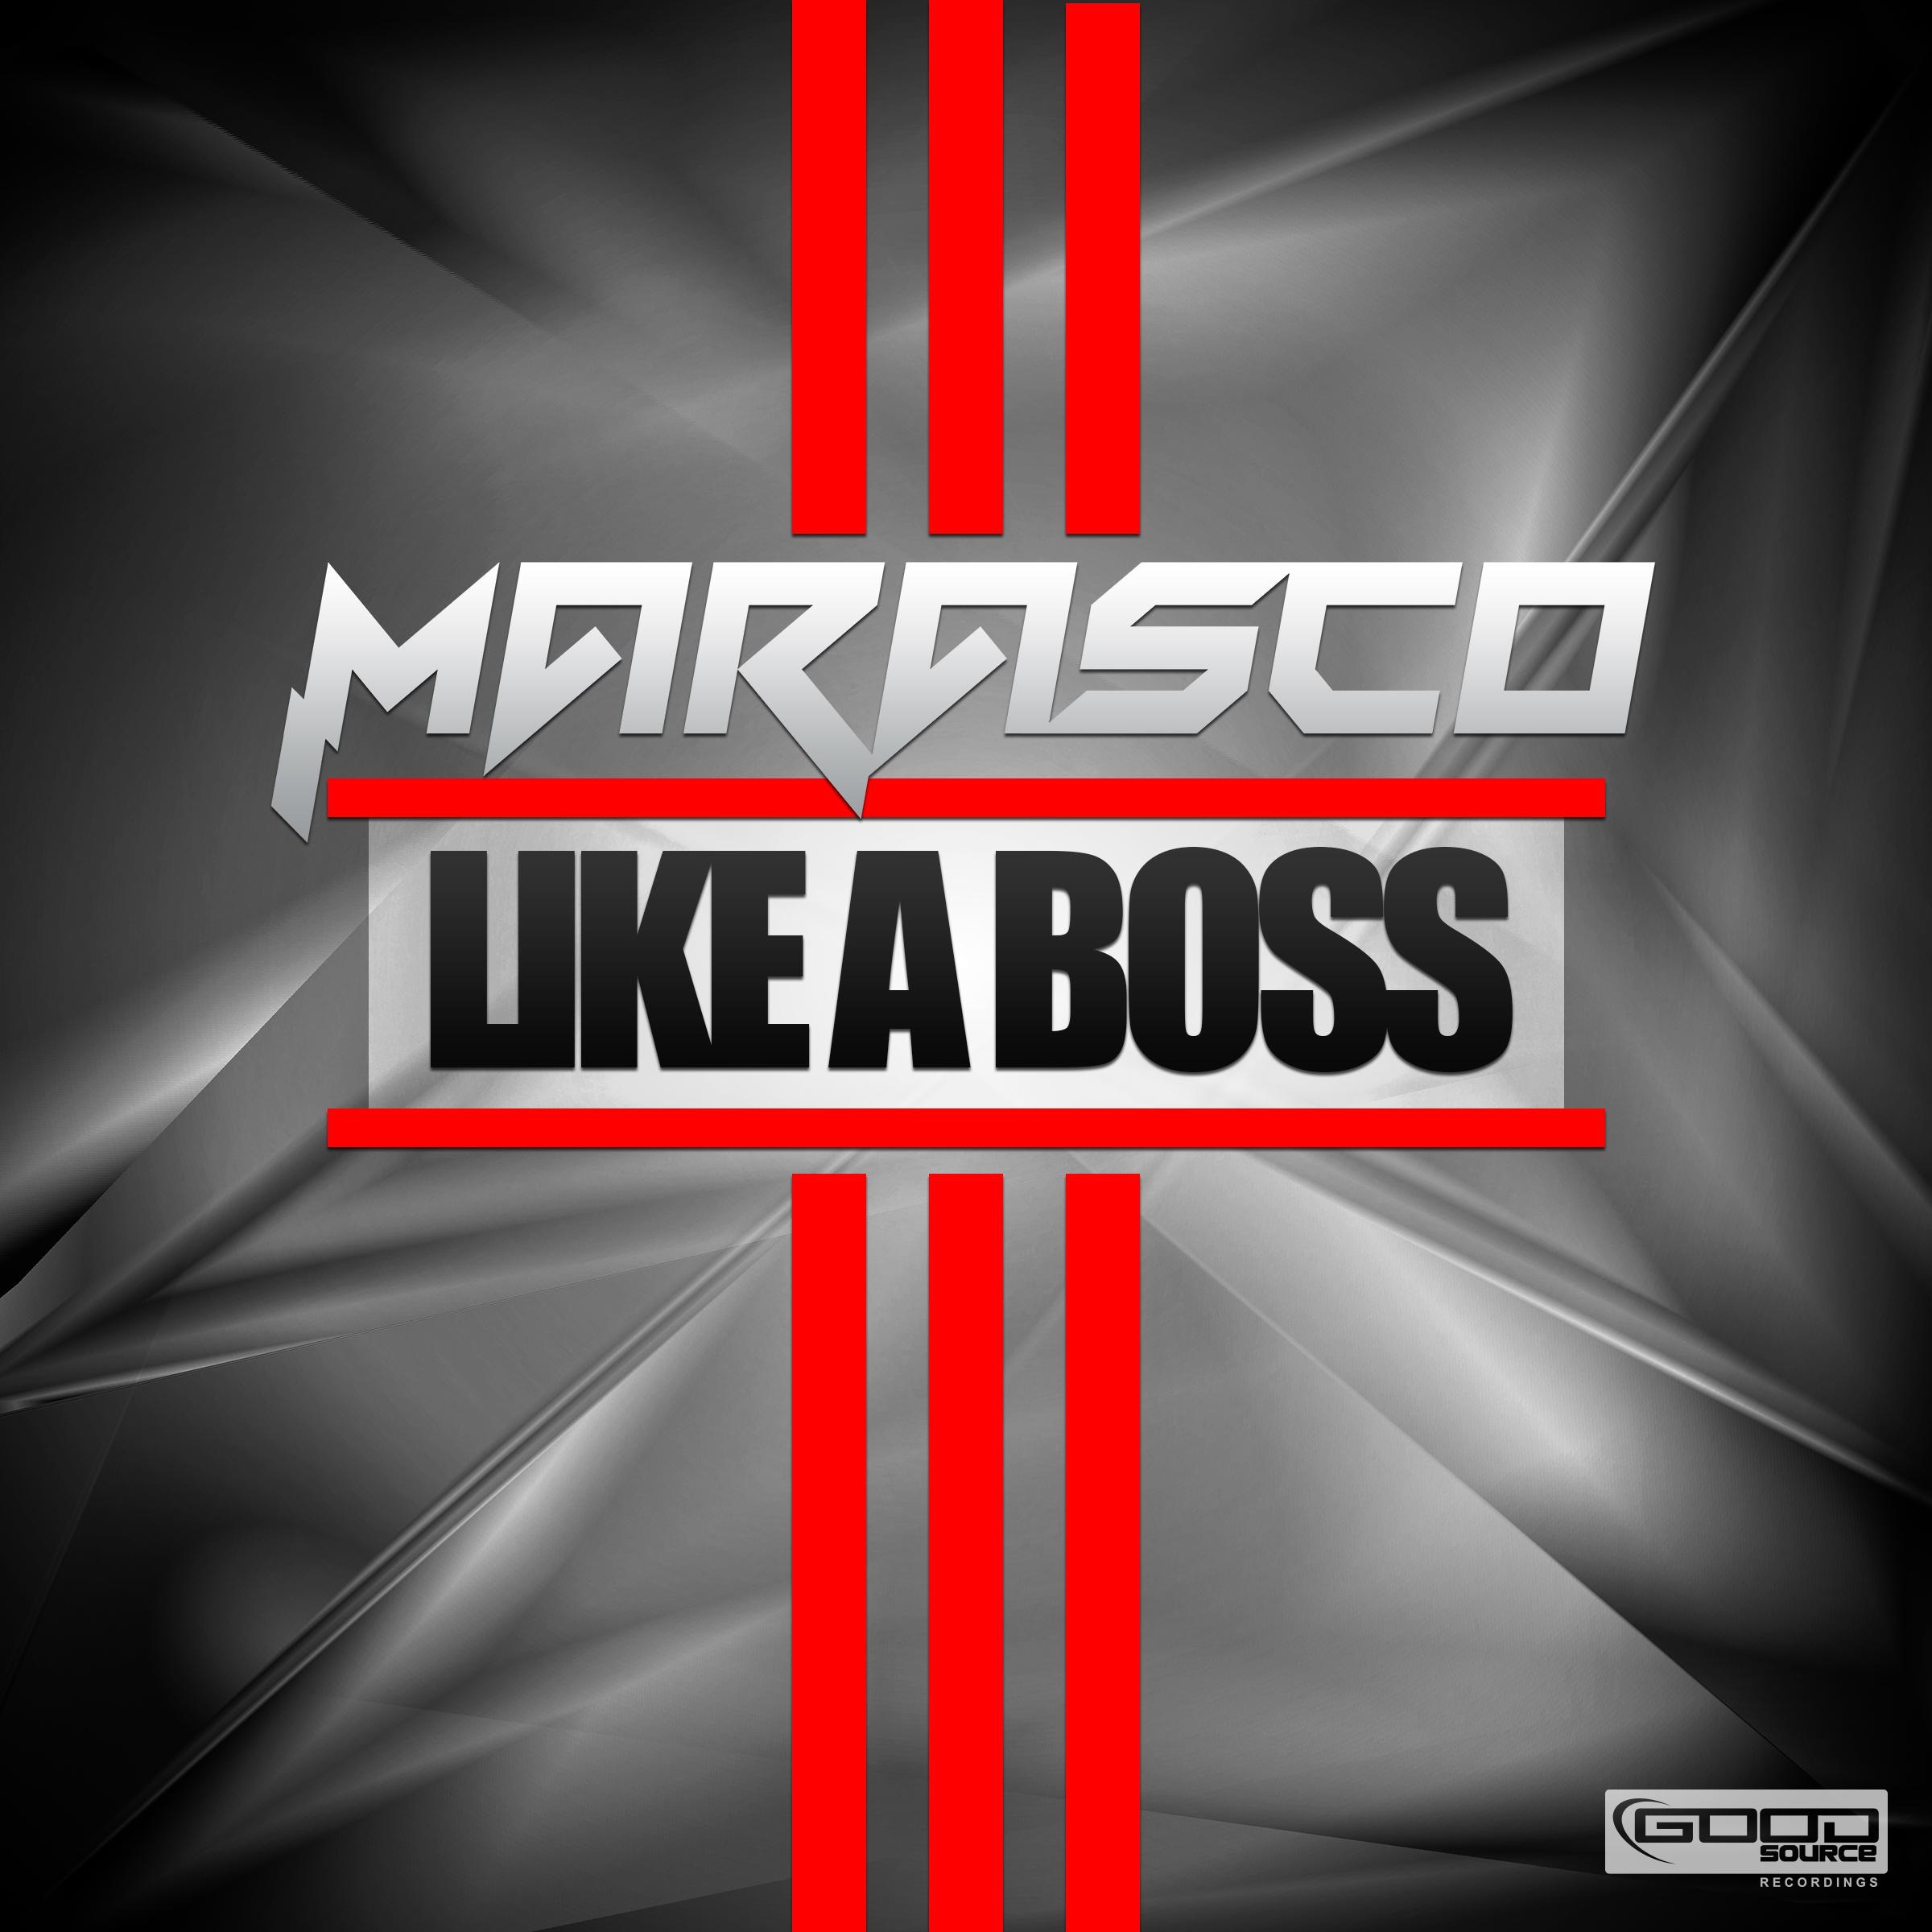 Like a Boss (Radio Edit)